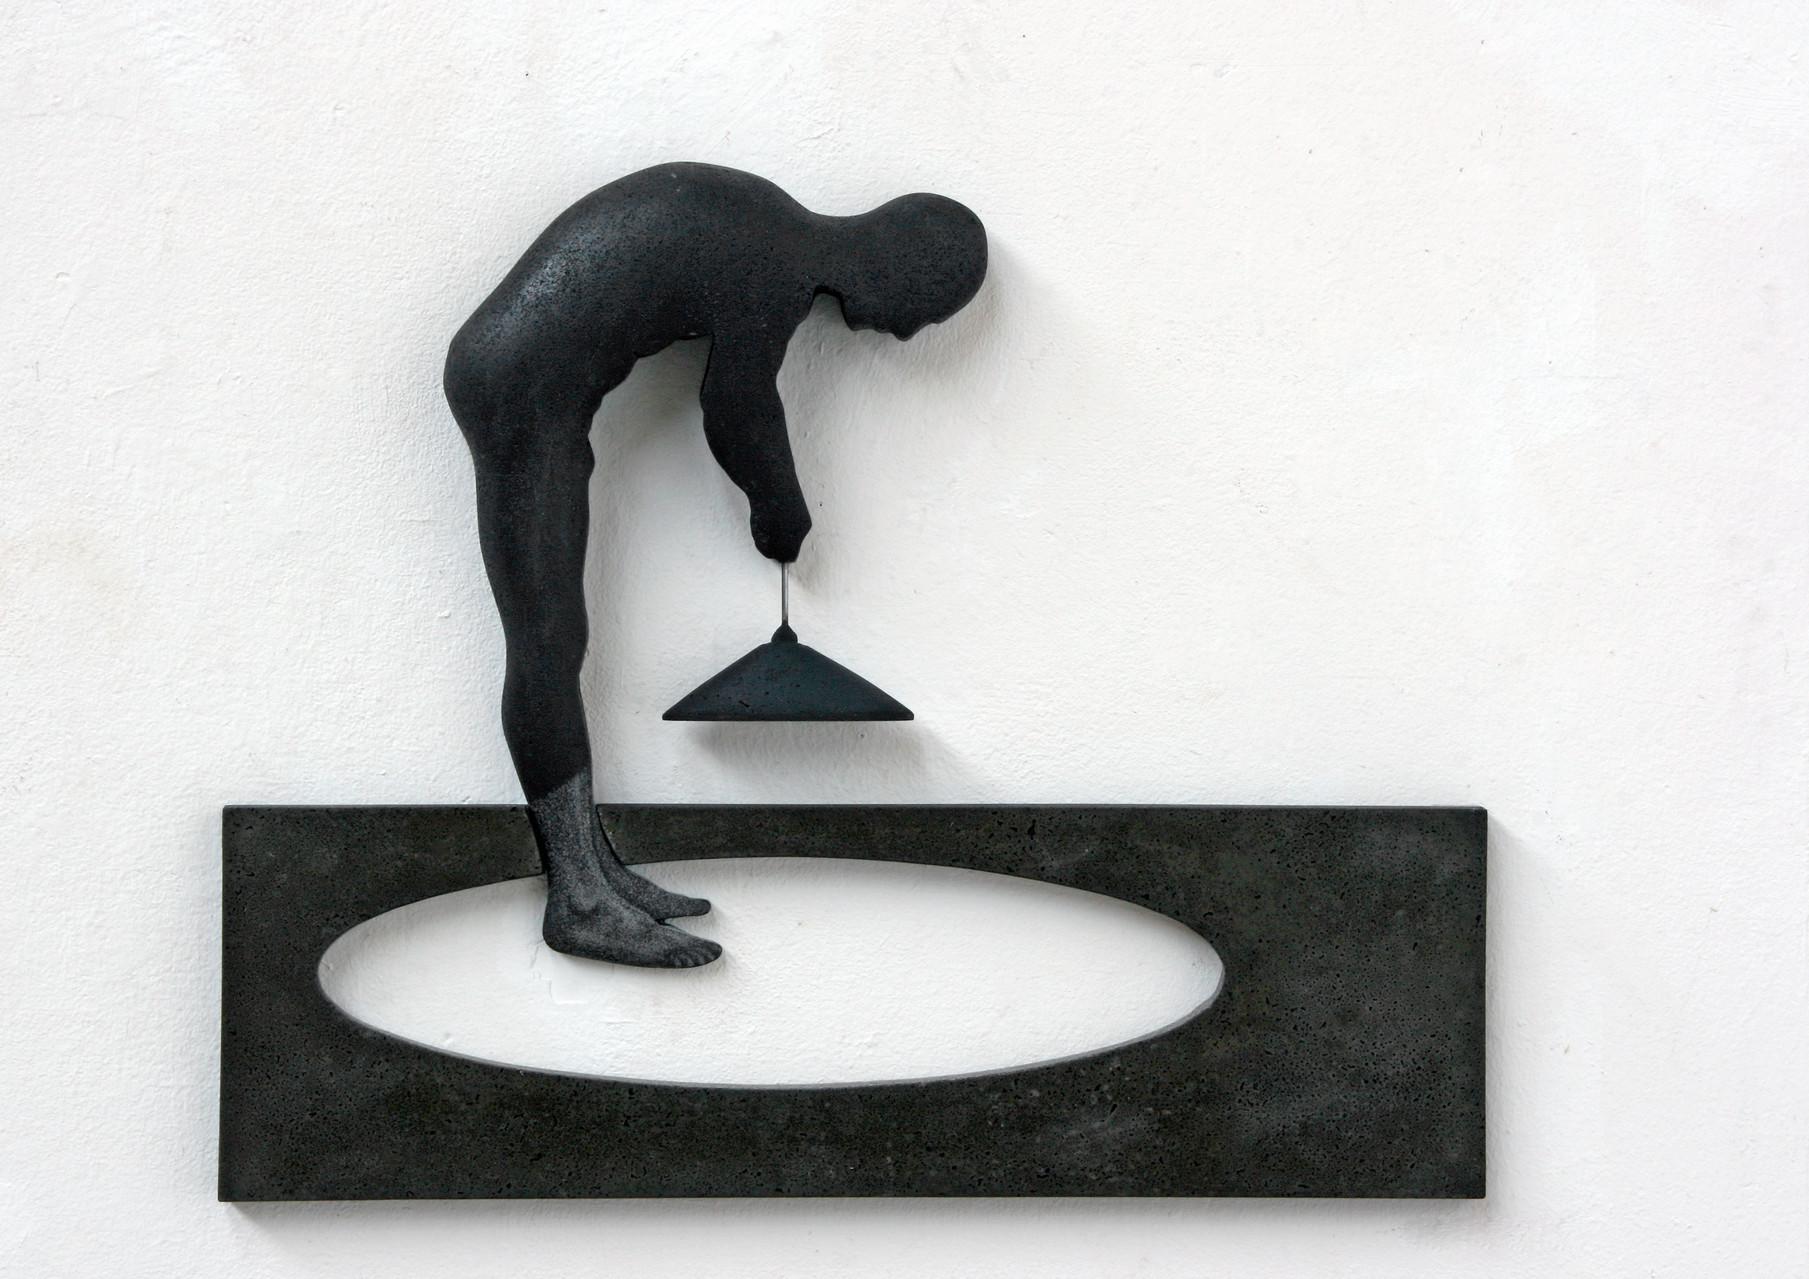 """Mann mit Lampe"", Beton / Gravur, 50 x 60 x 7, 2012"